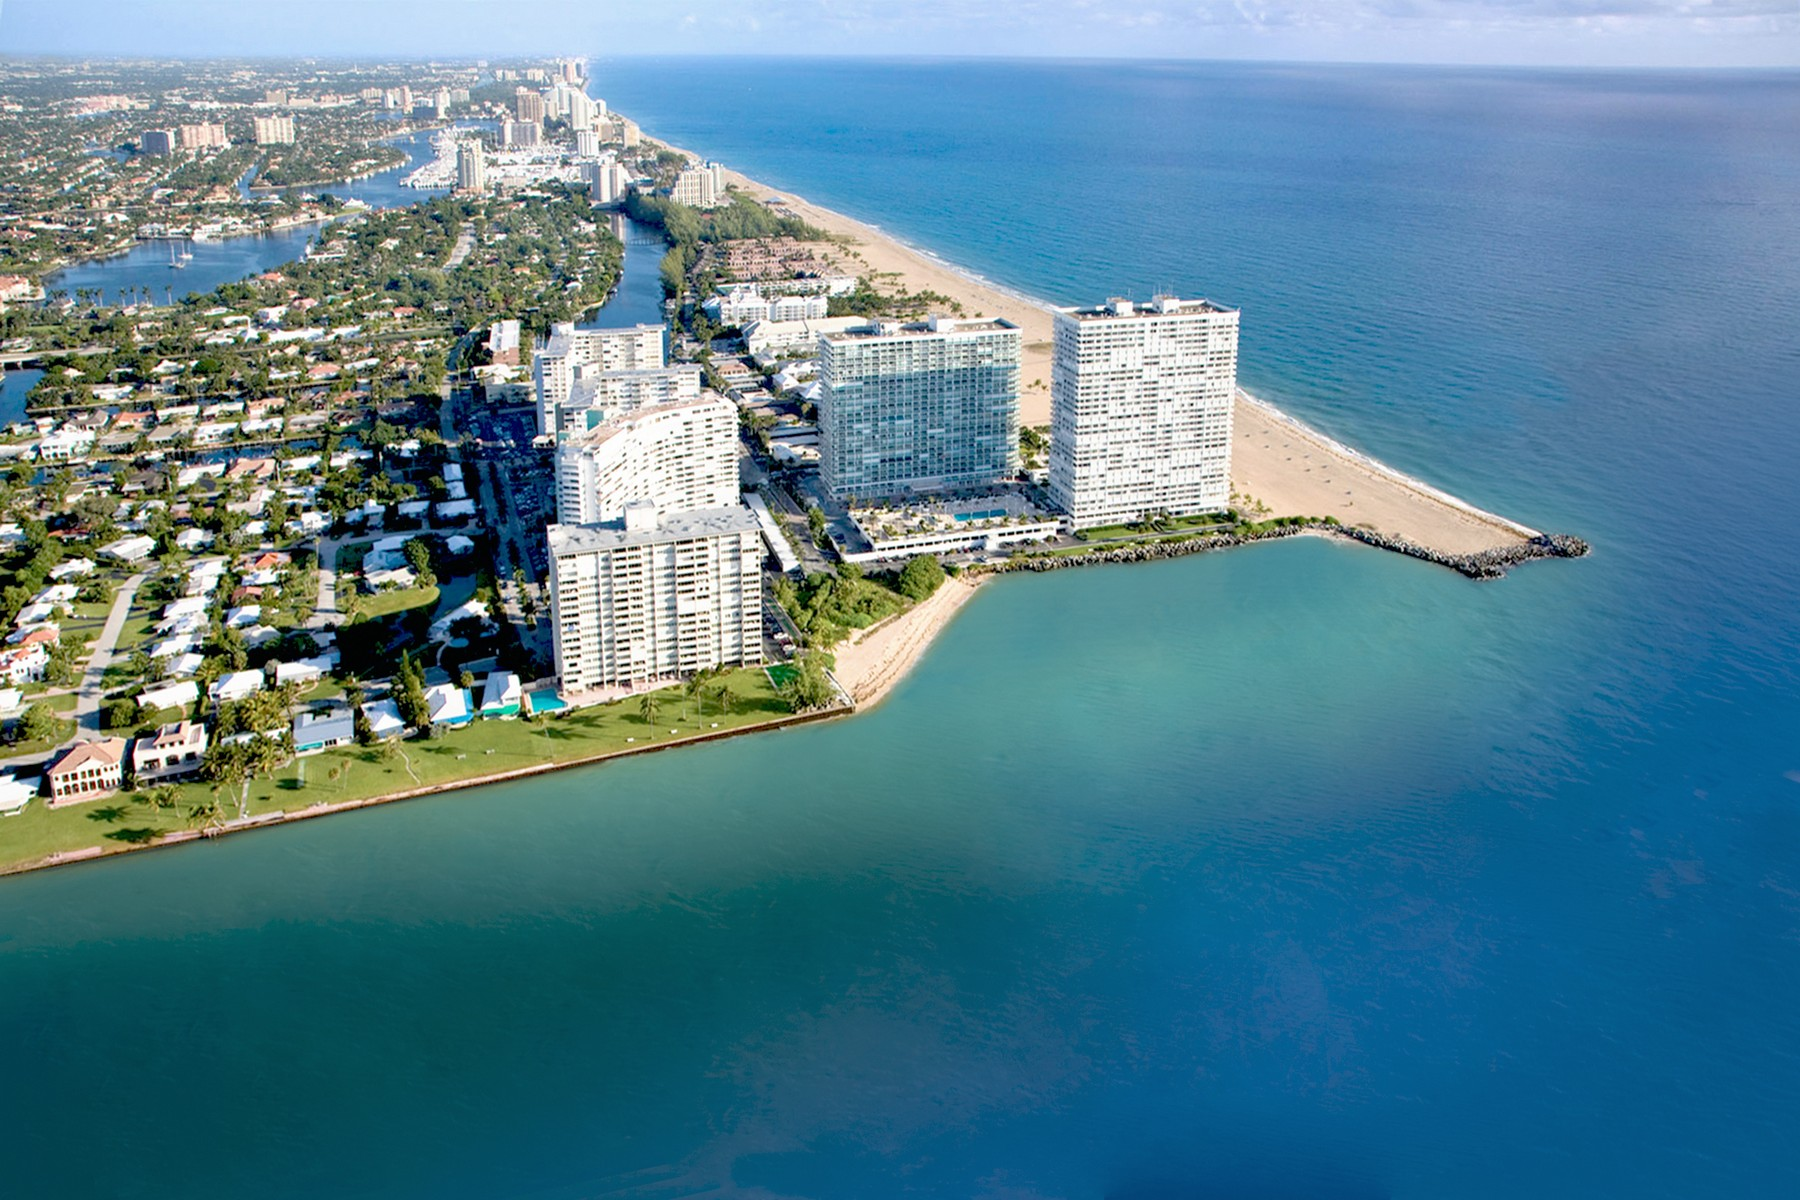 Condomínio para Venda às Point of Americas 2200 S. Ocean Ln. #2306 Fort Lauderdale, Florida 33316 Estados Unidos